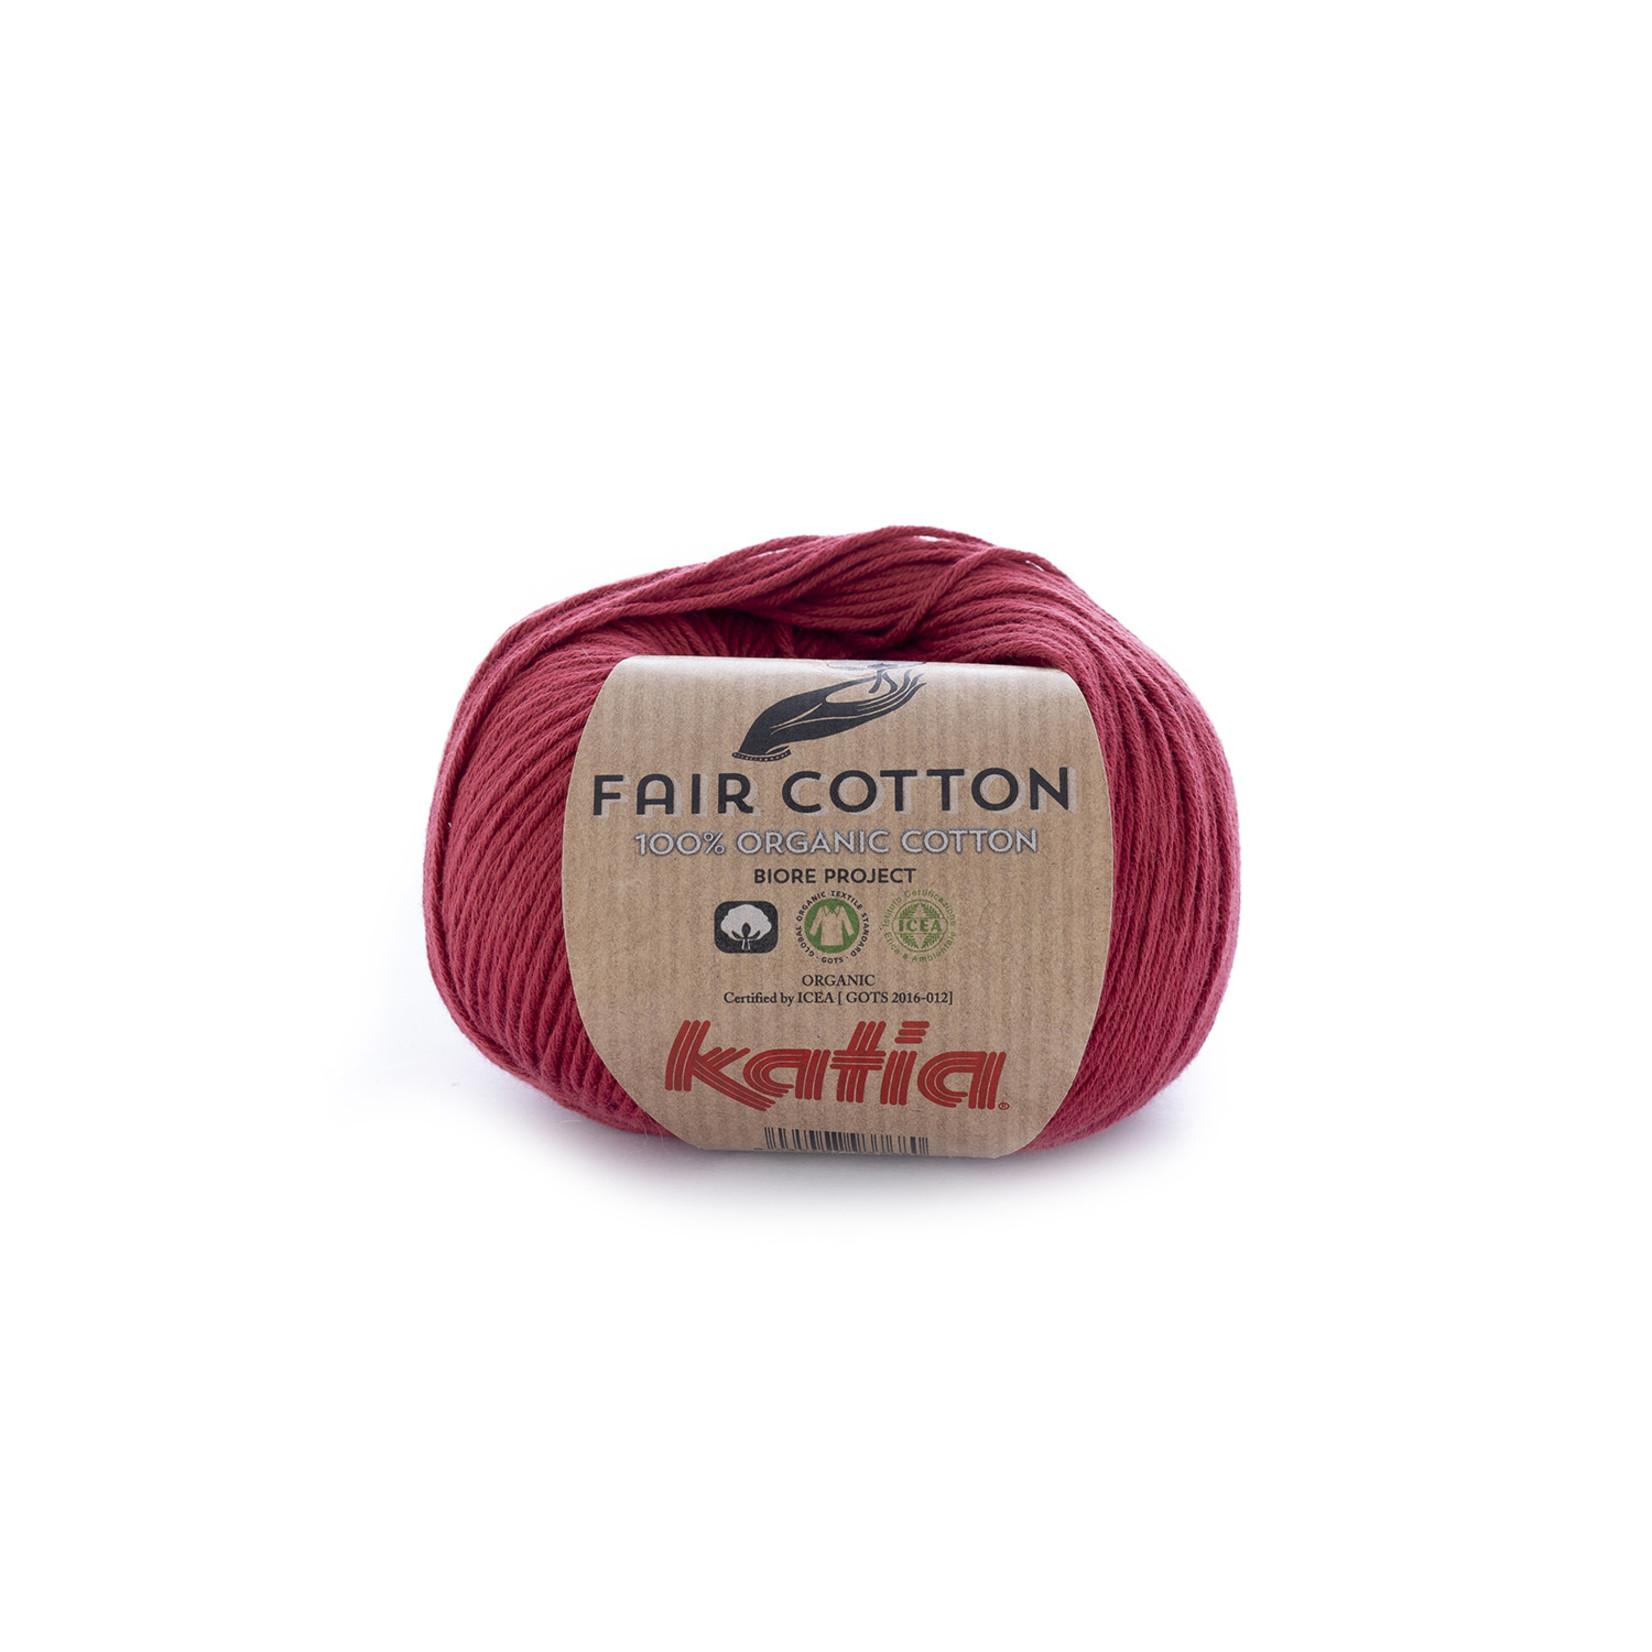 Katia Katia Fair Cotton 27 - wijnrood - 1 bol = 50 gr. = 155 m. - 100% biol. katoen